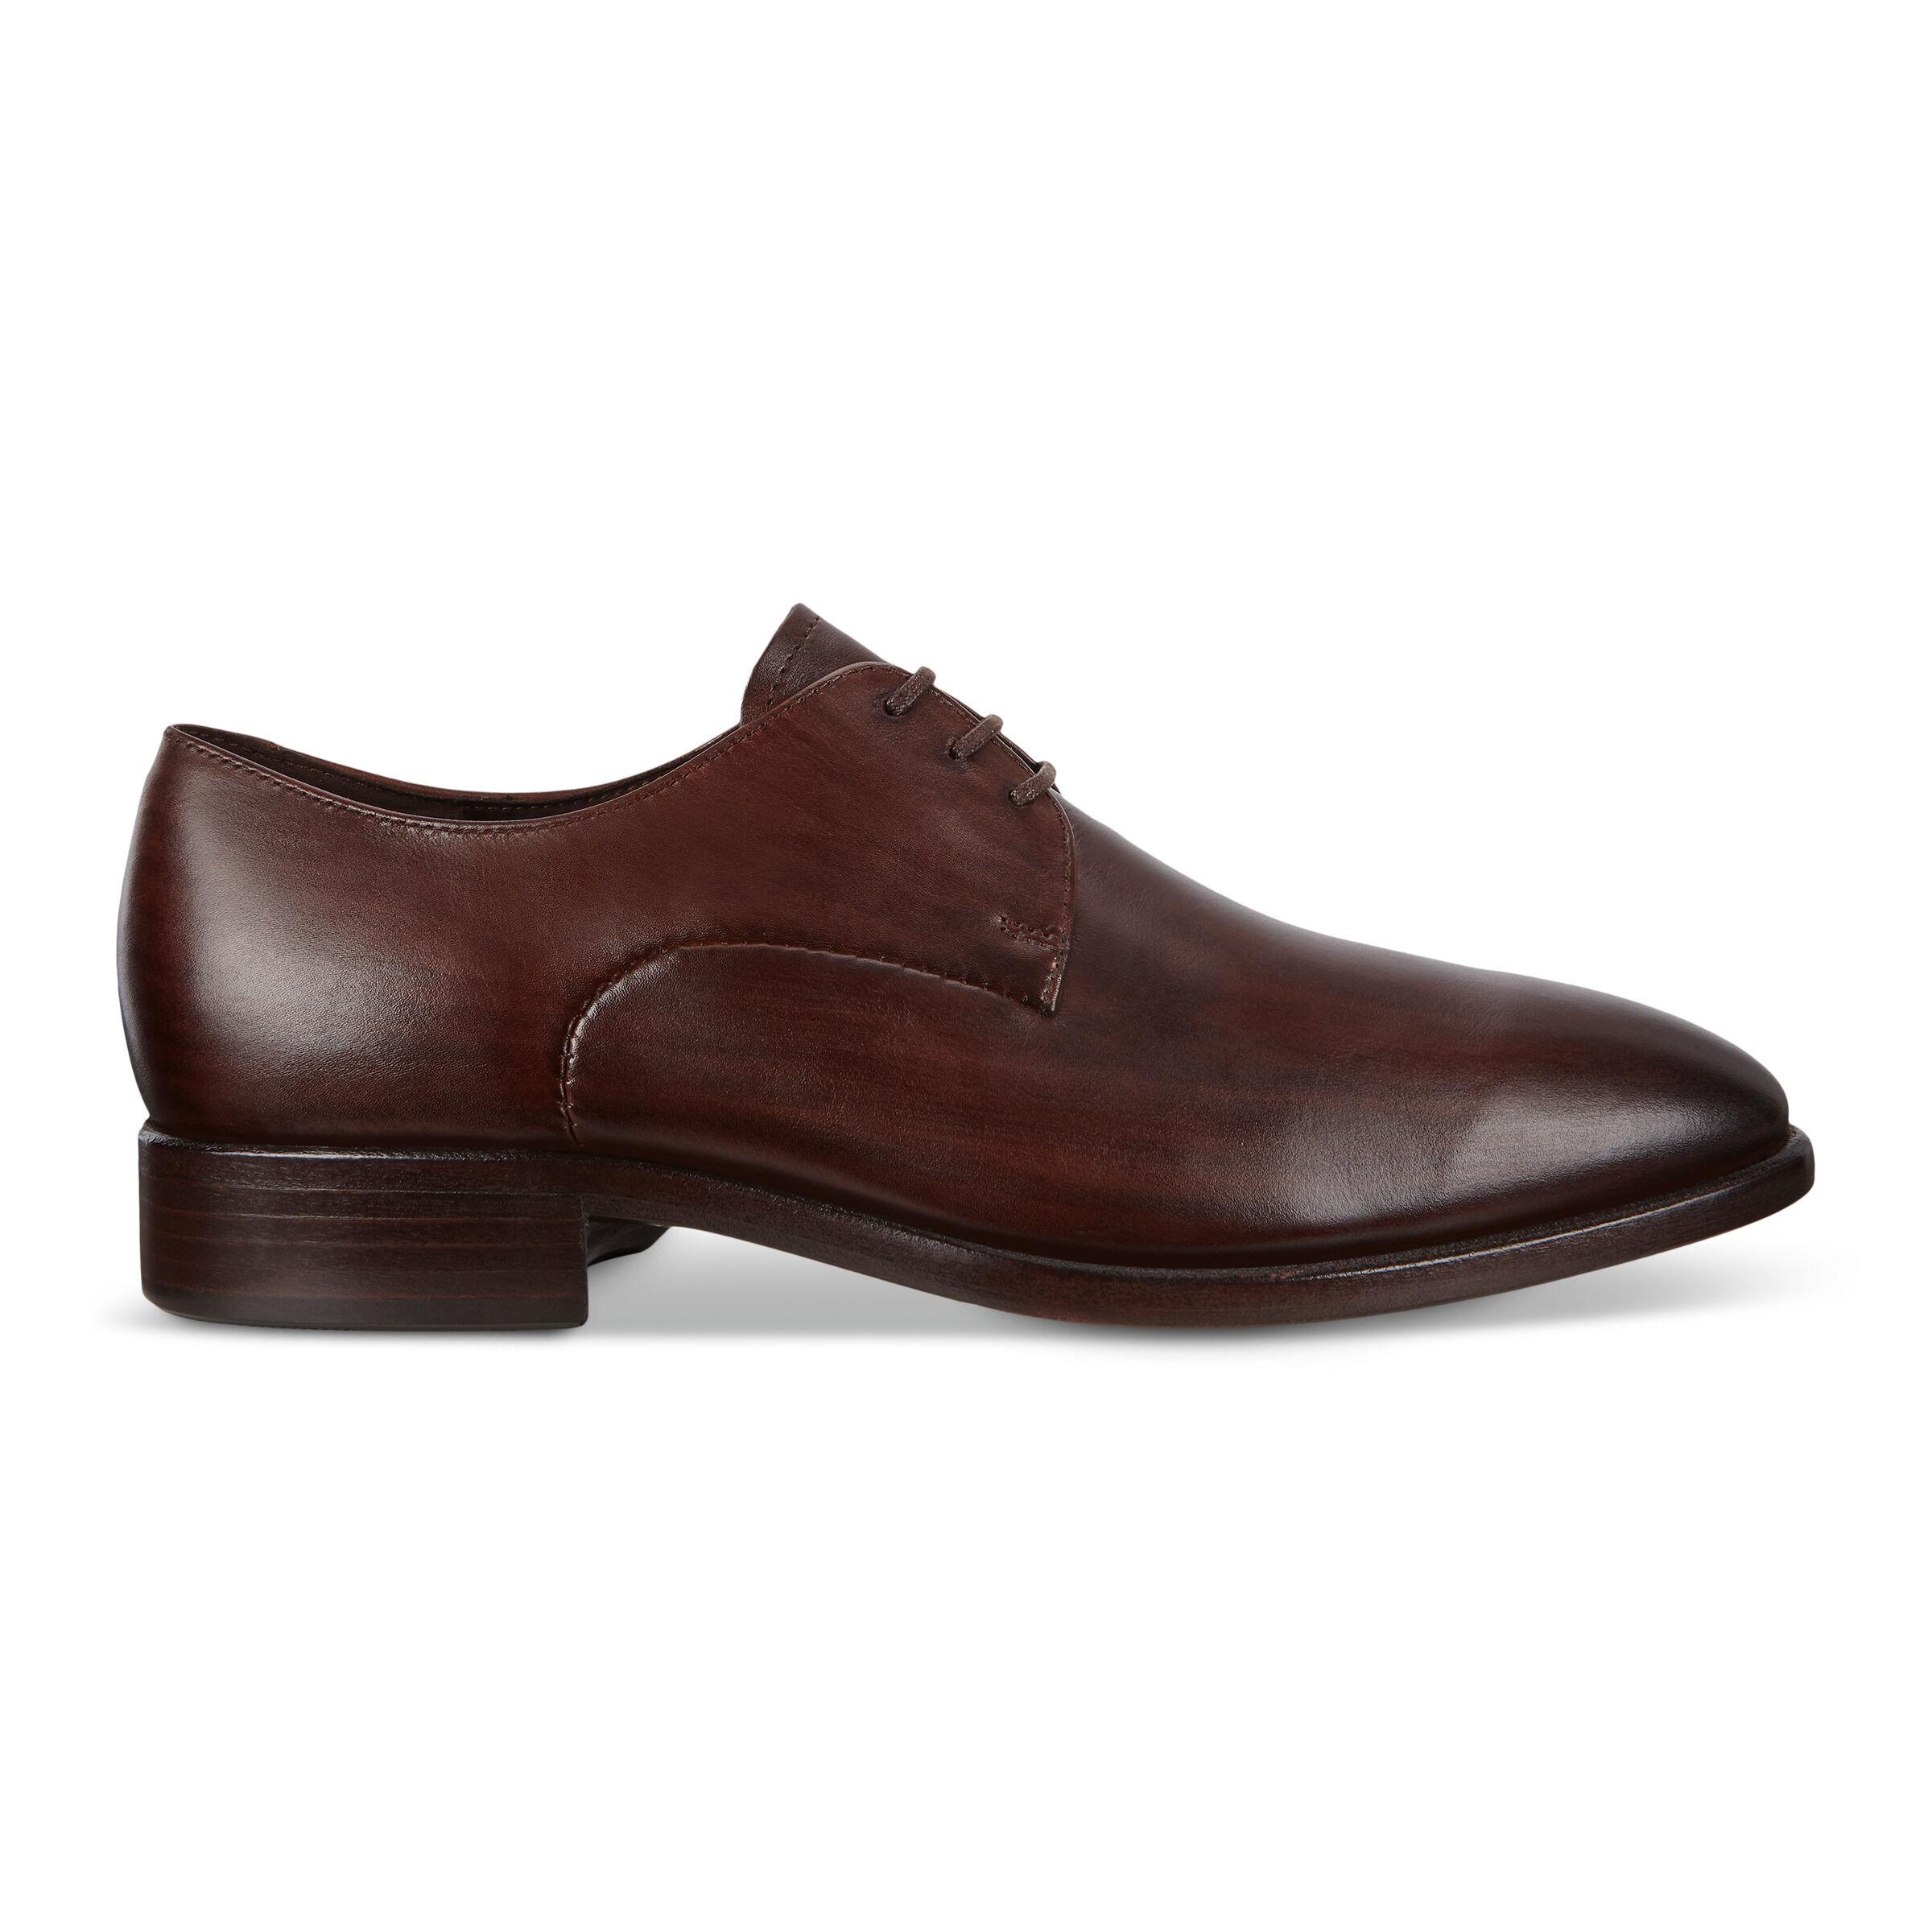 ECCO Vitrus Mondial Mens Shoes: 8 - Cocoa Brown